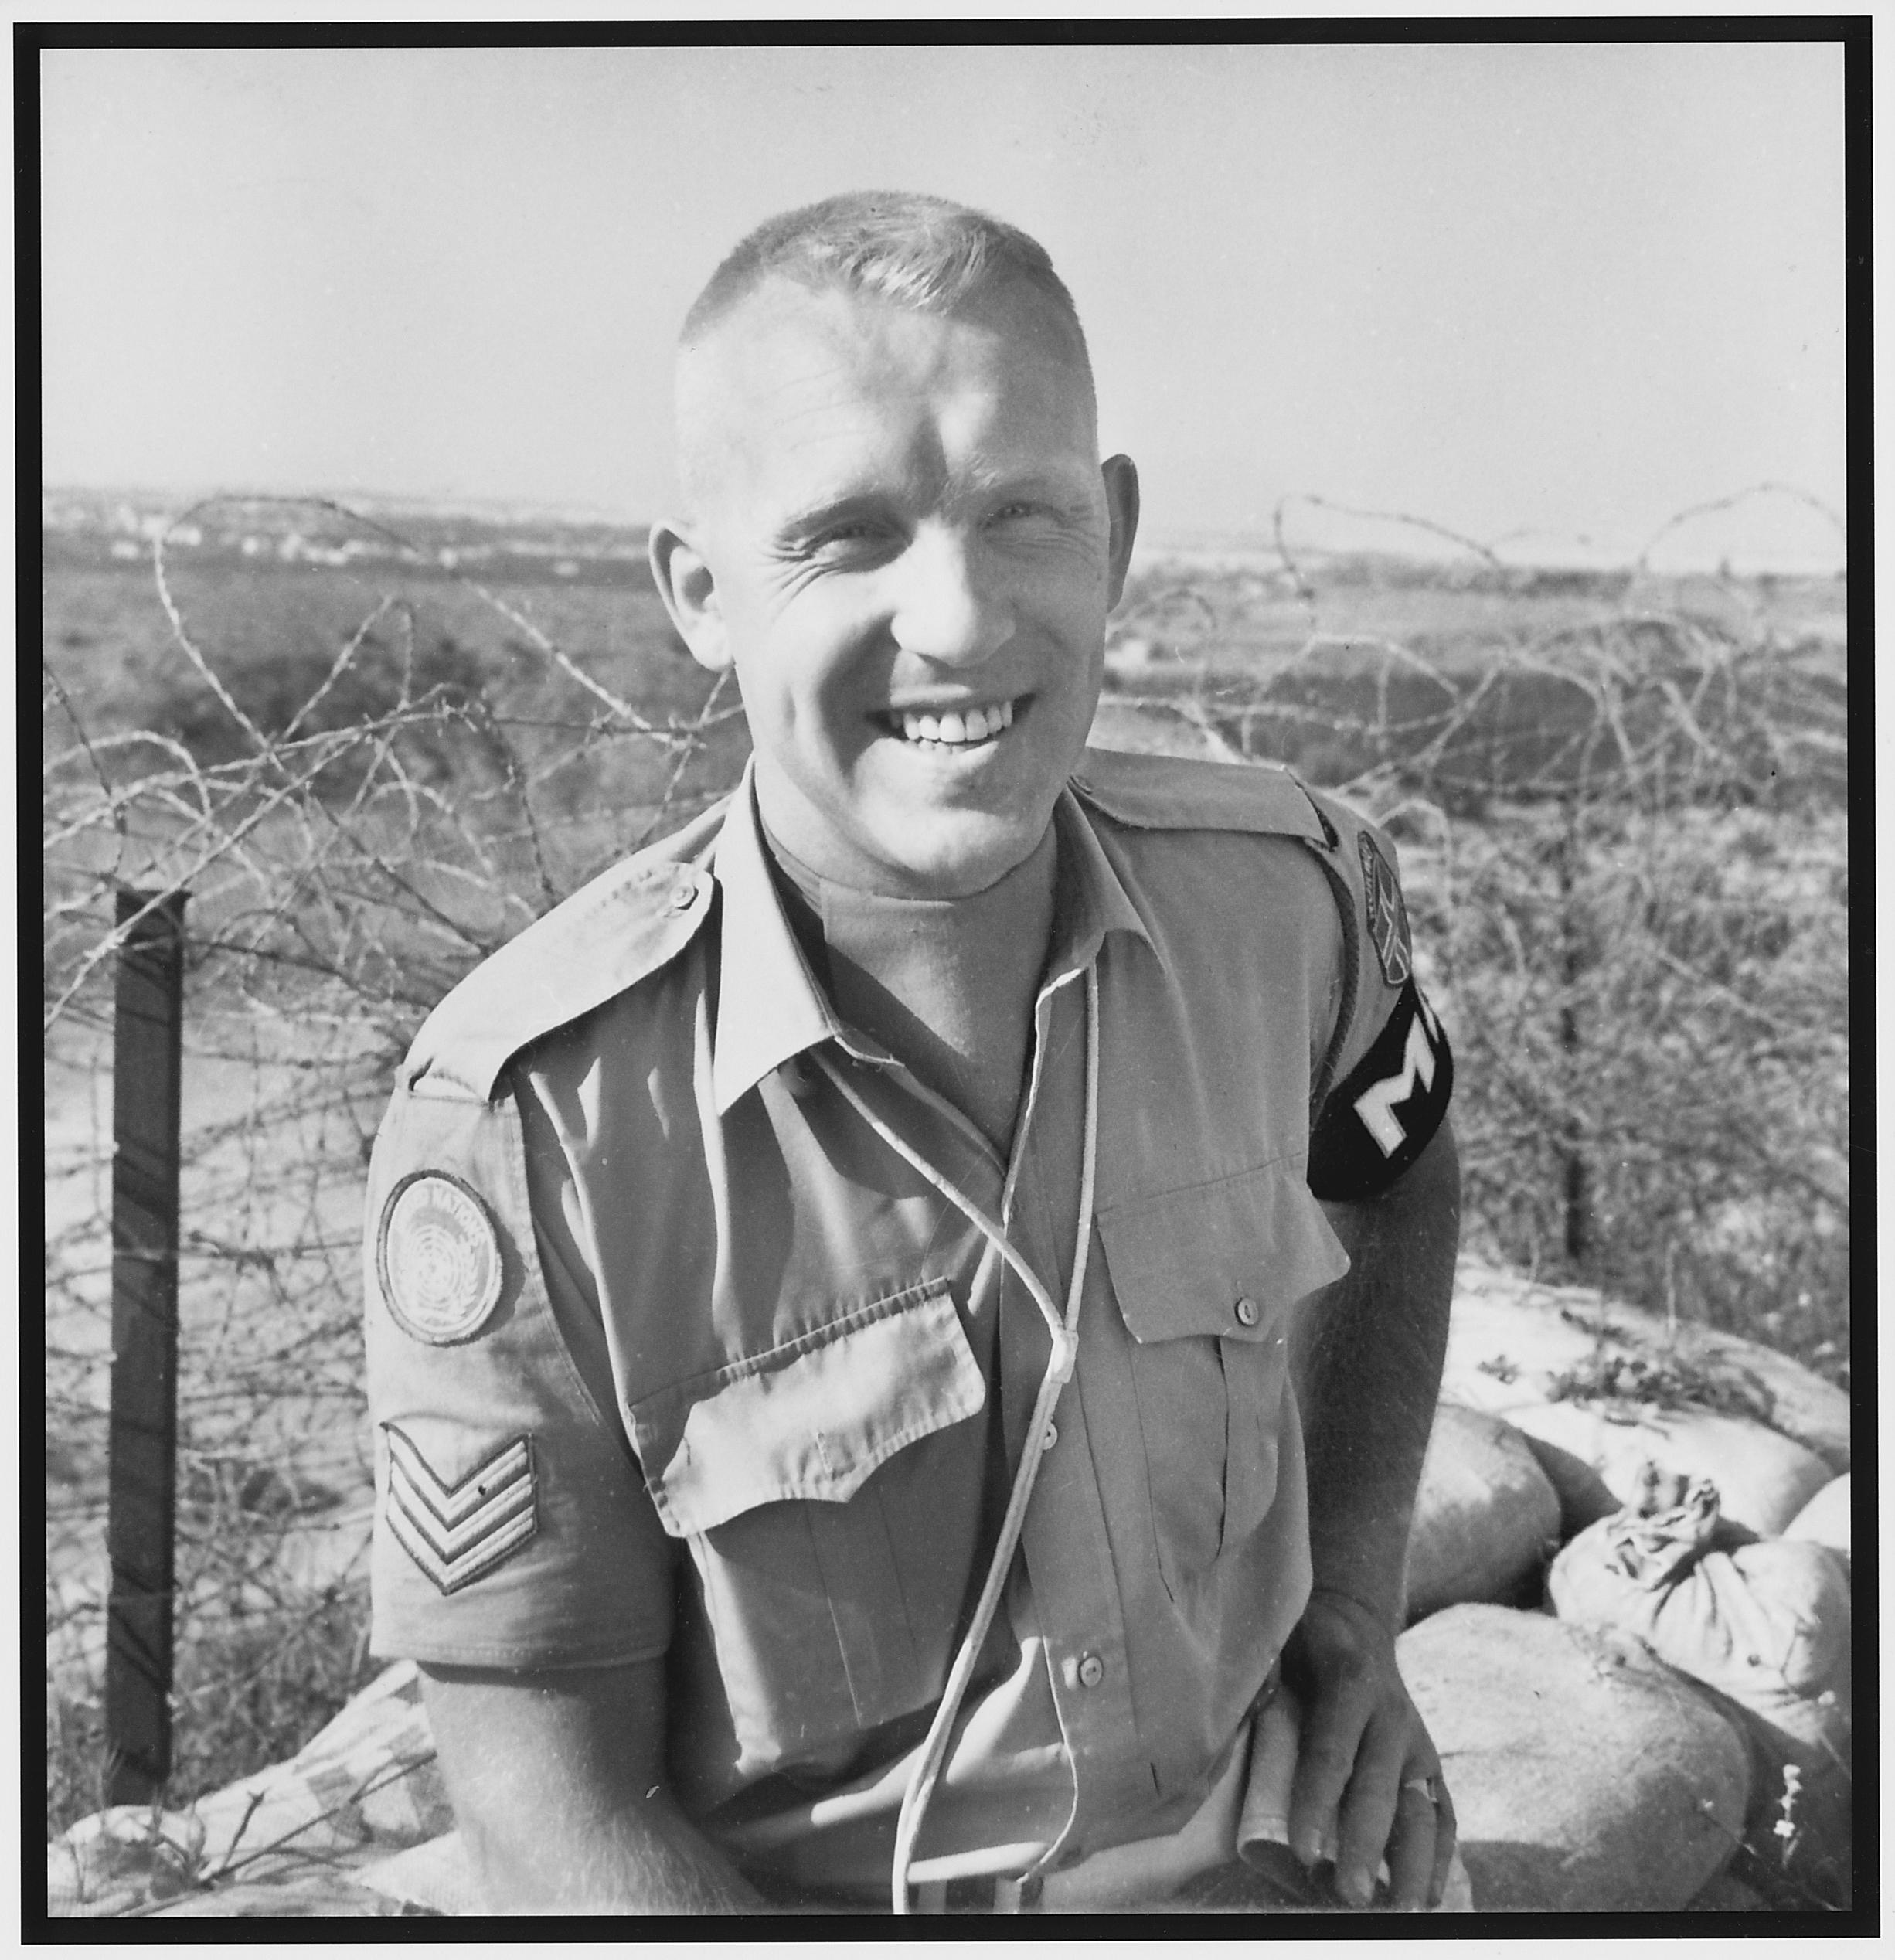 Arne Gerrit Halvorsen i aktiv tjeneste.